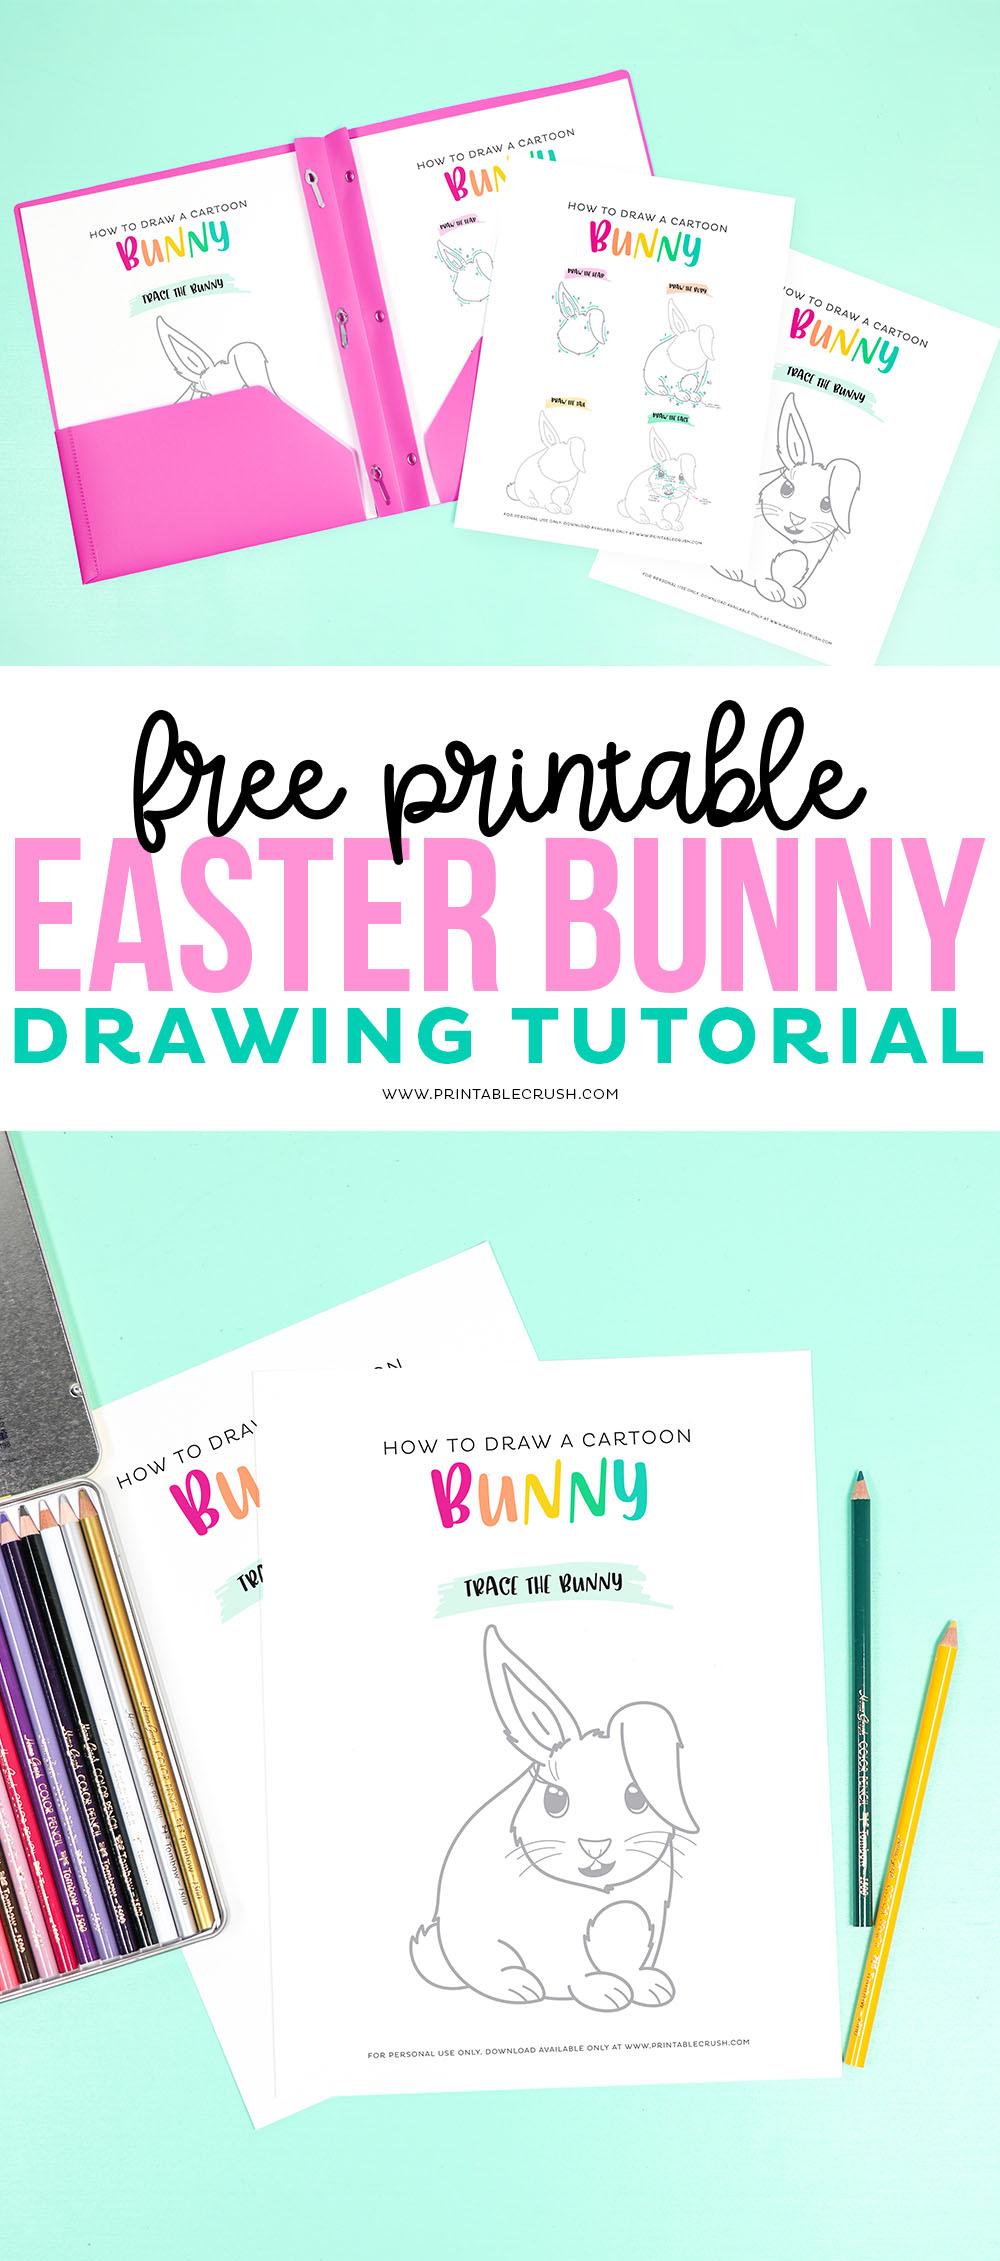 How to Draw an Easter Bunny Free Printable Drawing Tutorial - Cartoon Easter Bunny Drawing Tutorial #drawingtutorial #freeprintable #easterprintable #easterbunny via @printablecrush